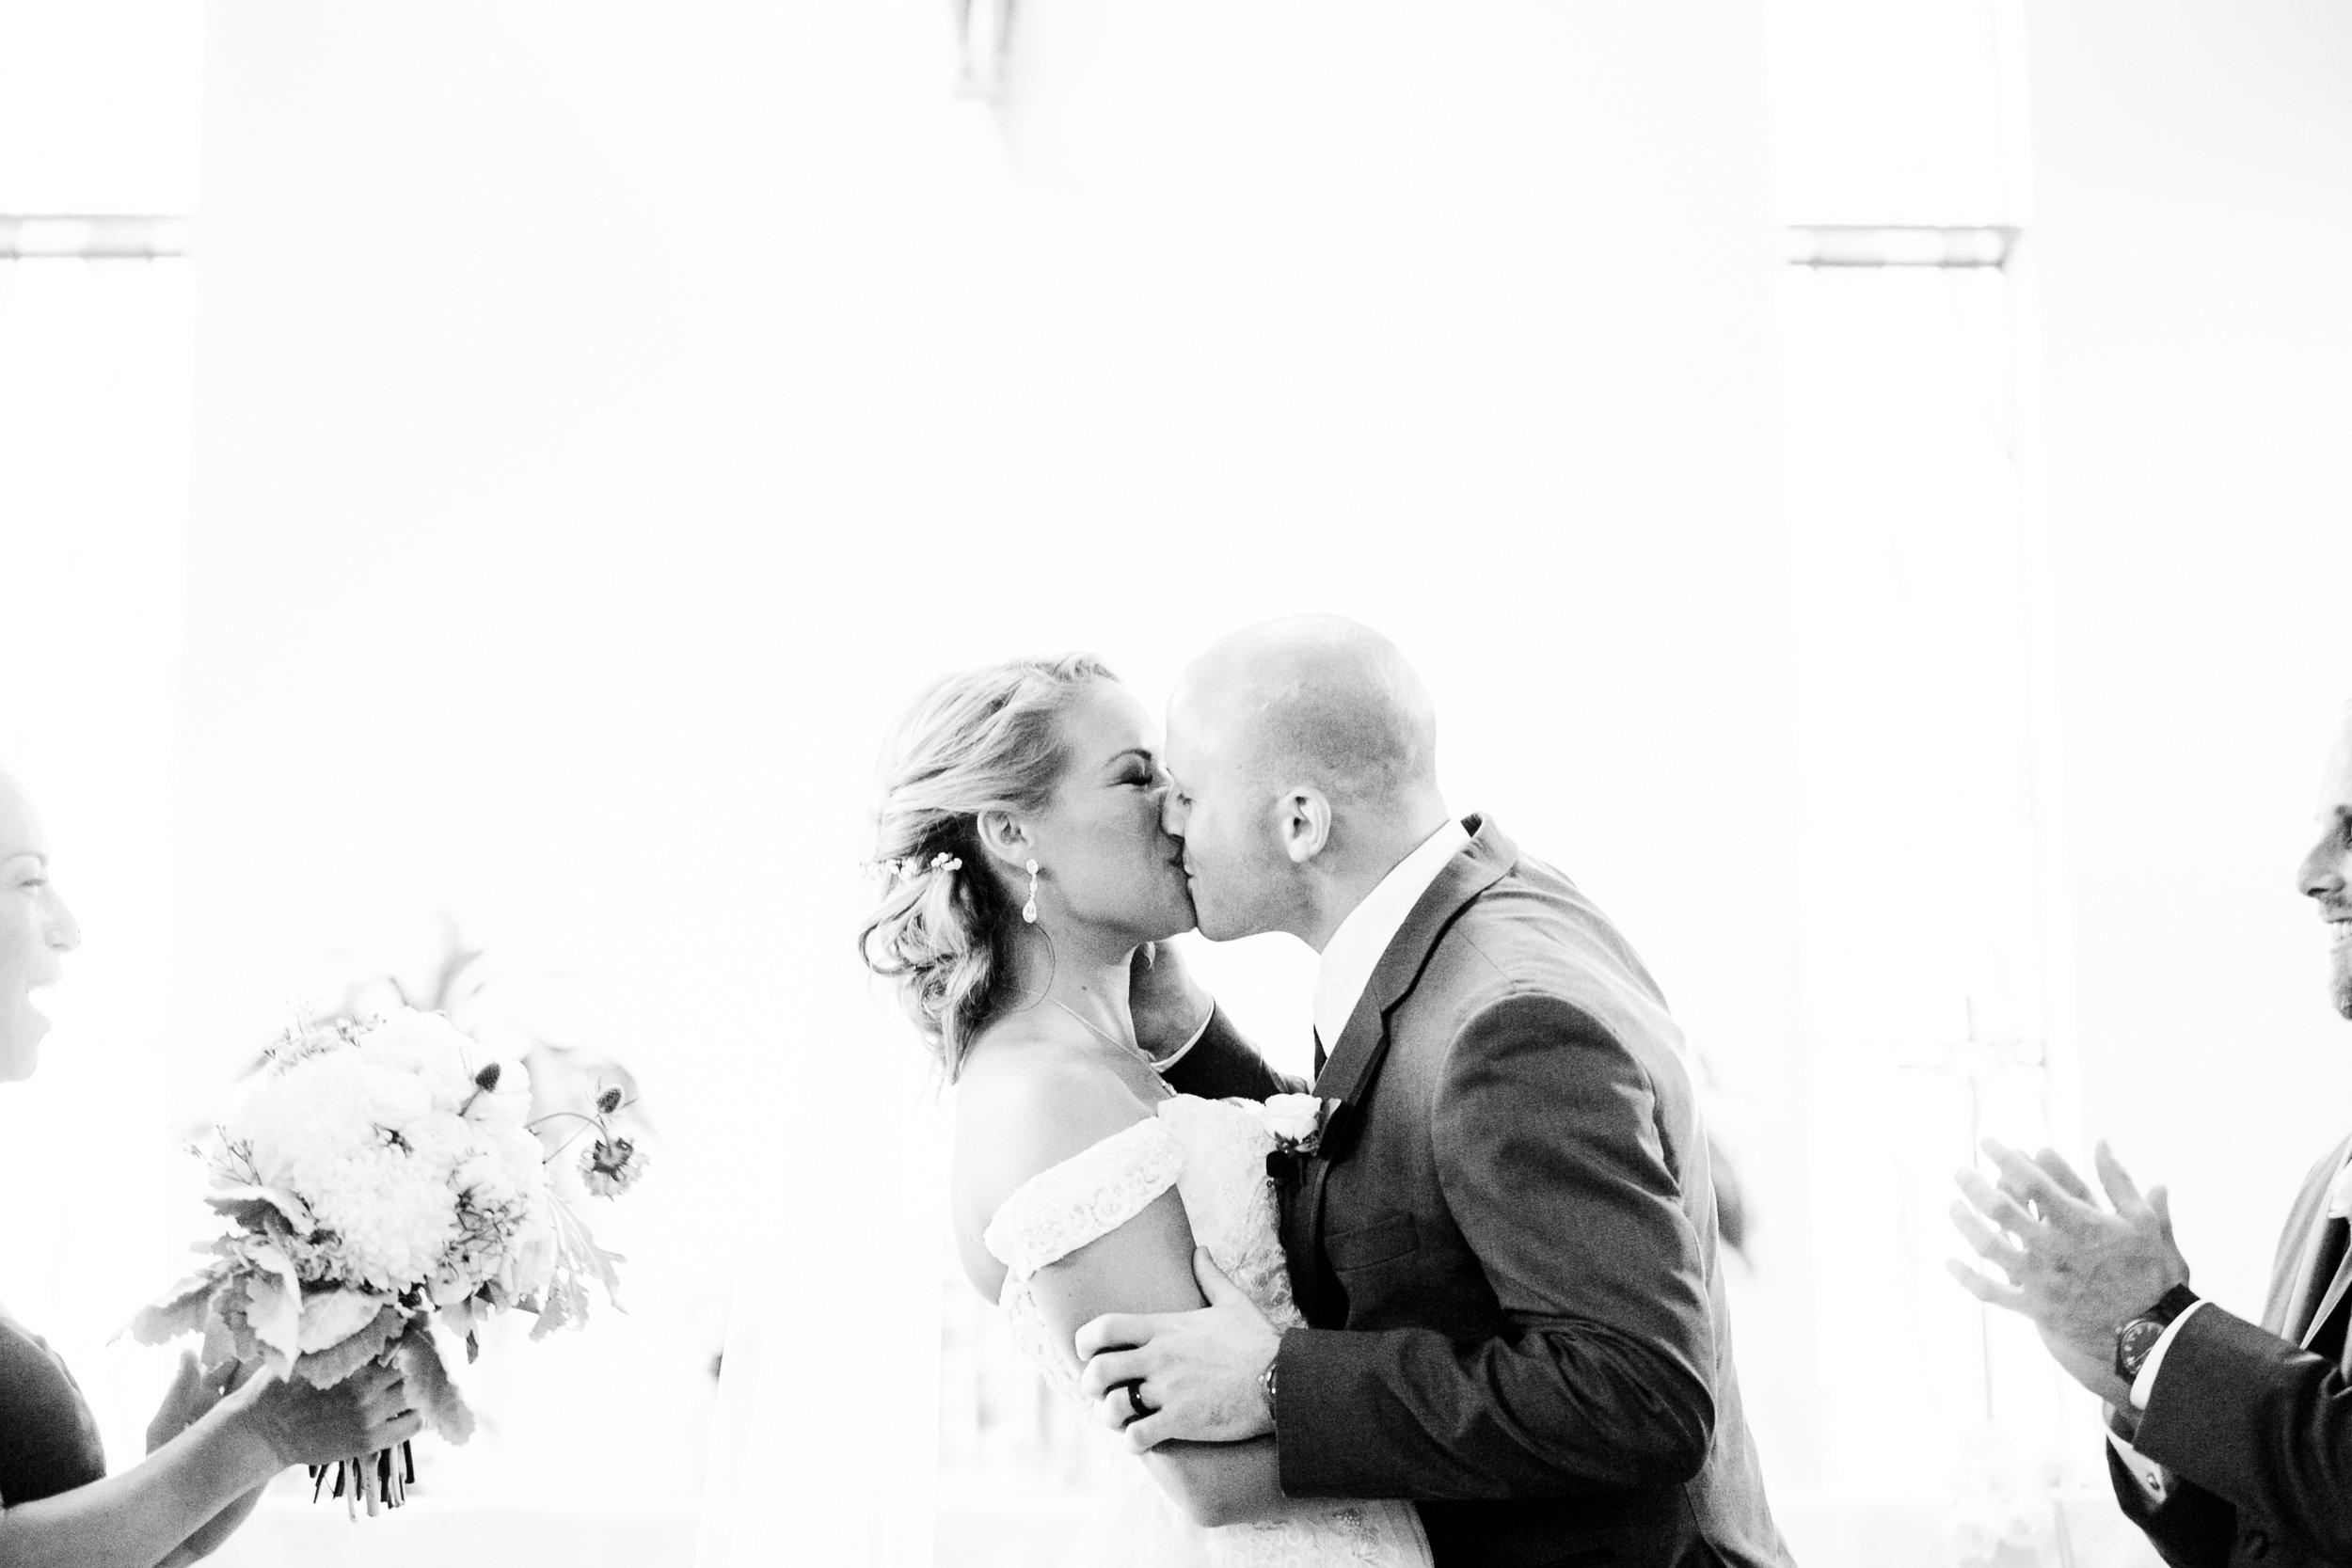 ICONA GOLDEN INN AVALON NJ WEDDING PHOTOGRAPHY  - 051.jpg